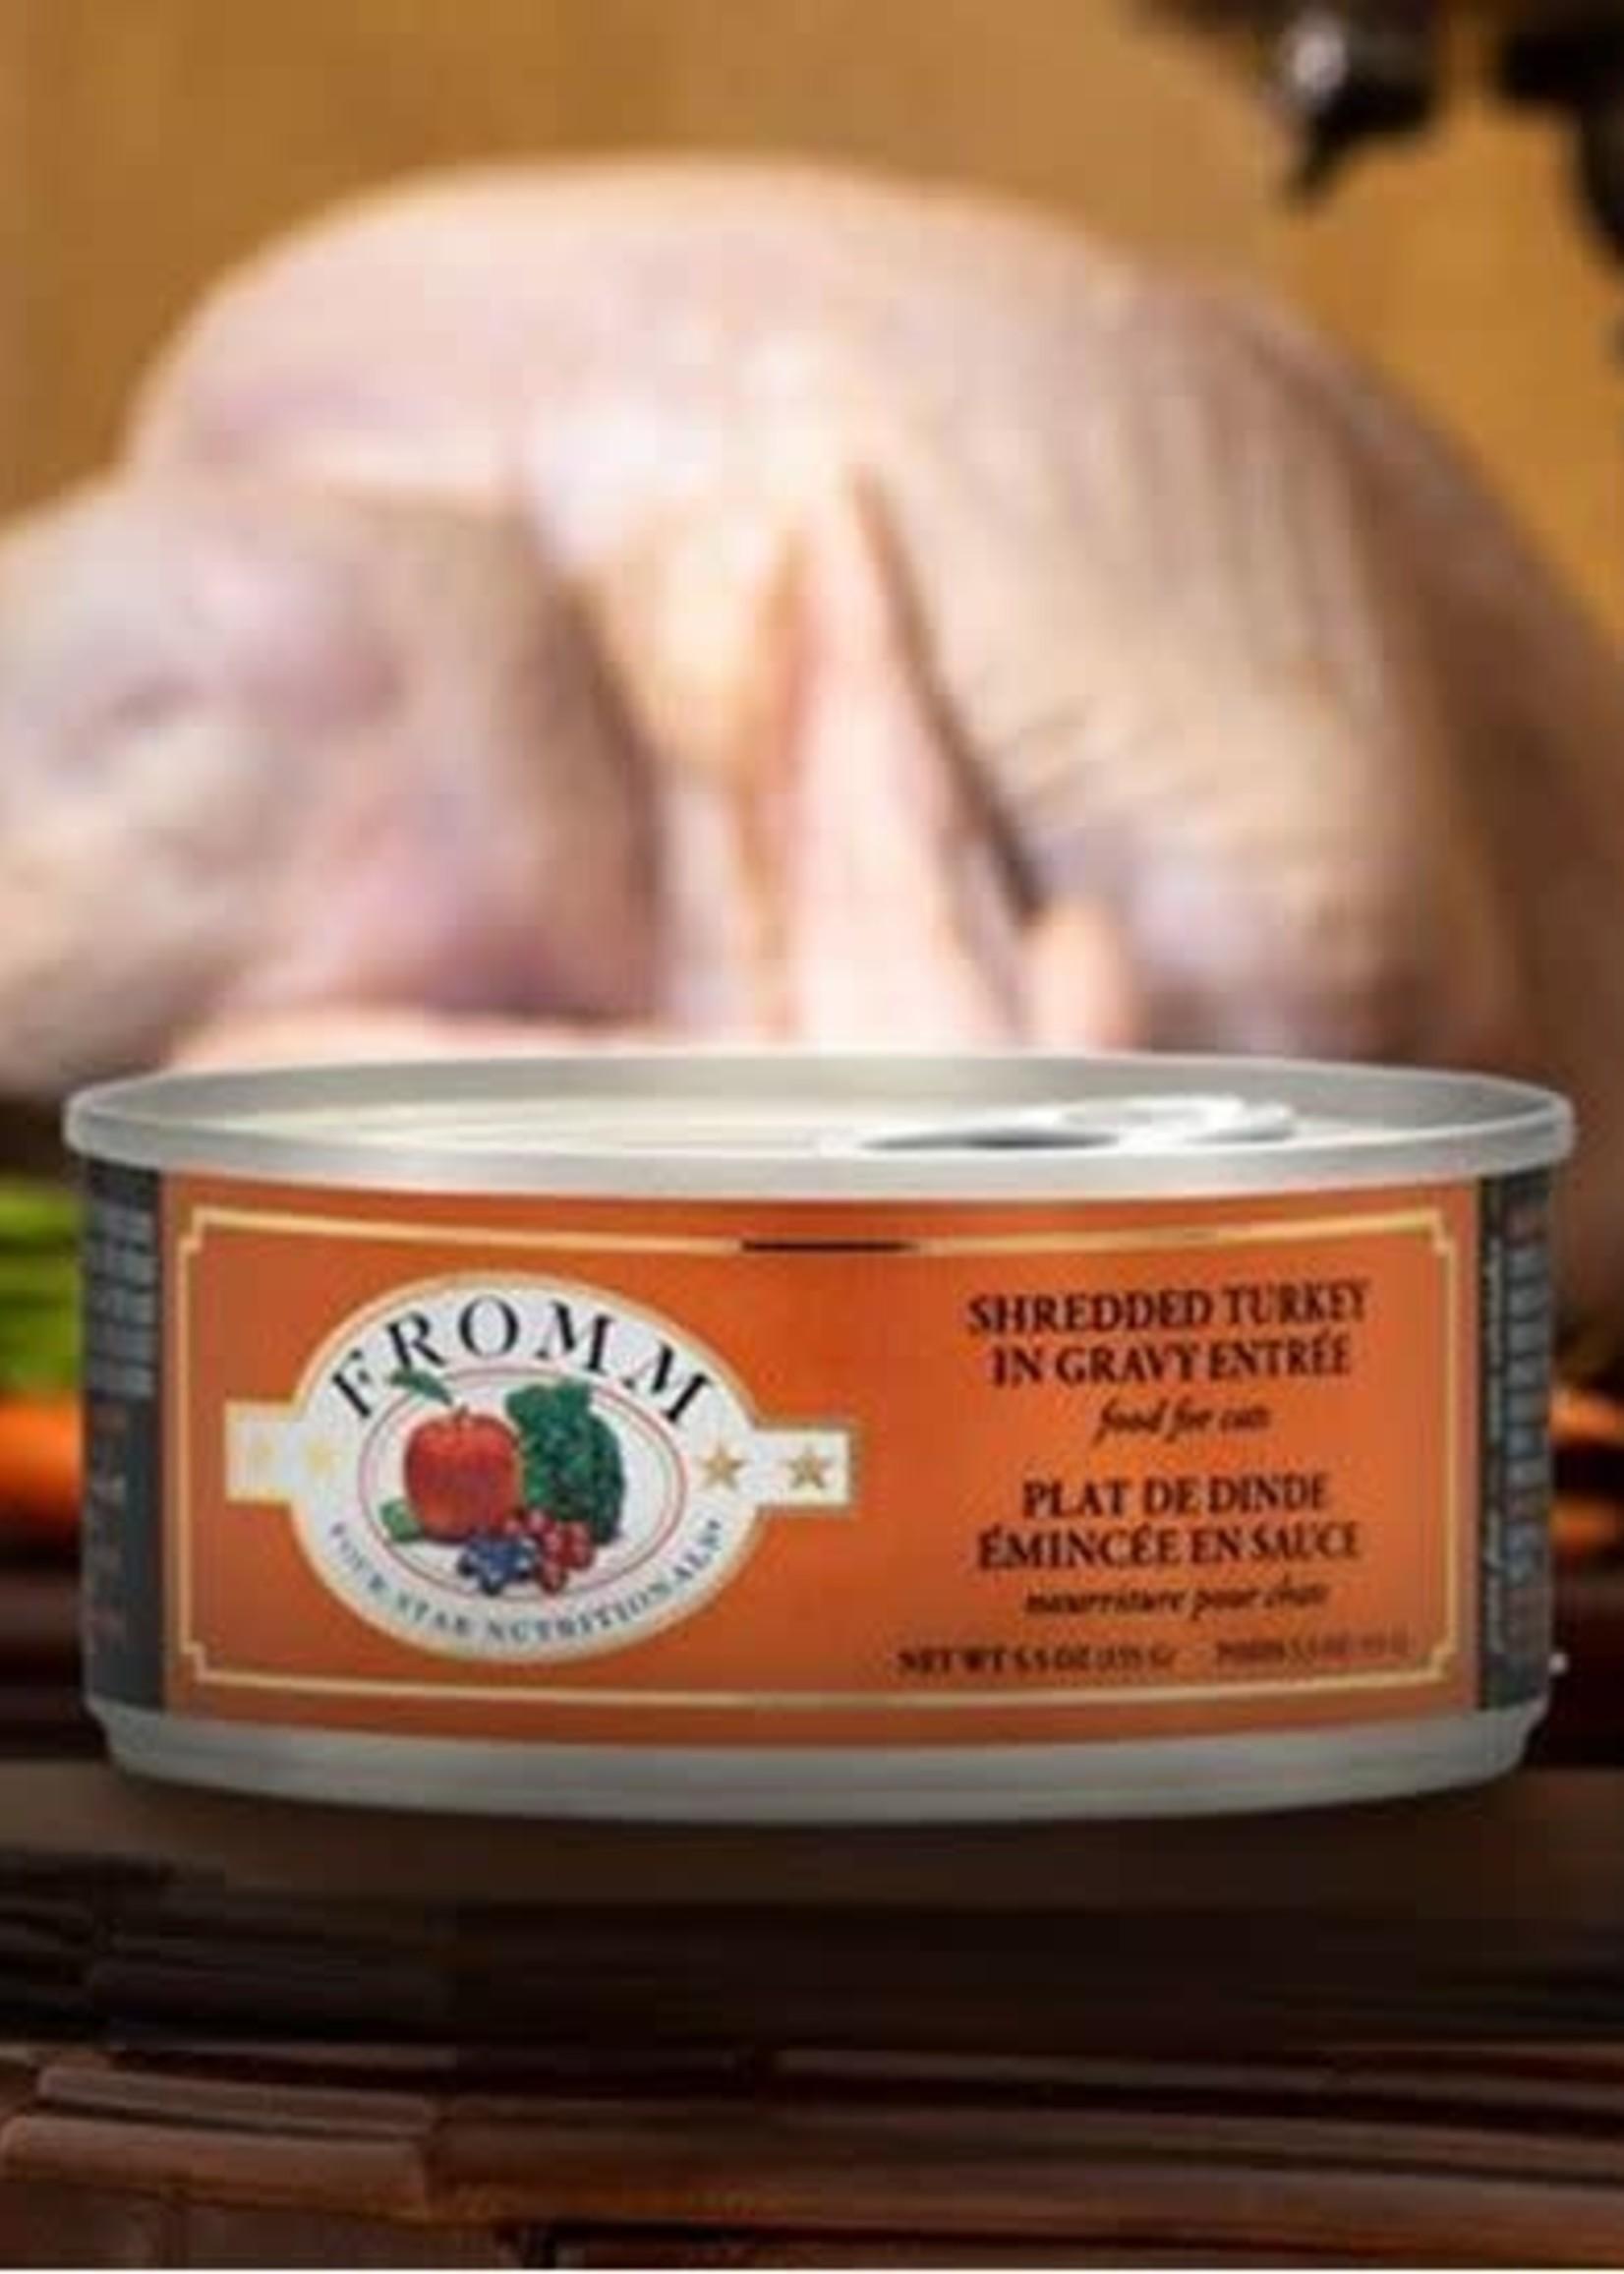 Fromm Fromm Four-Star Shredded Turkey in Gravy Entrée 5.5oz